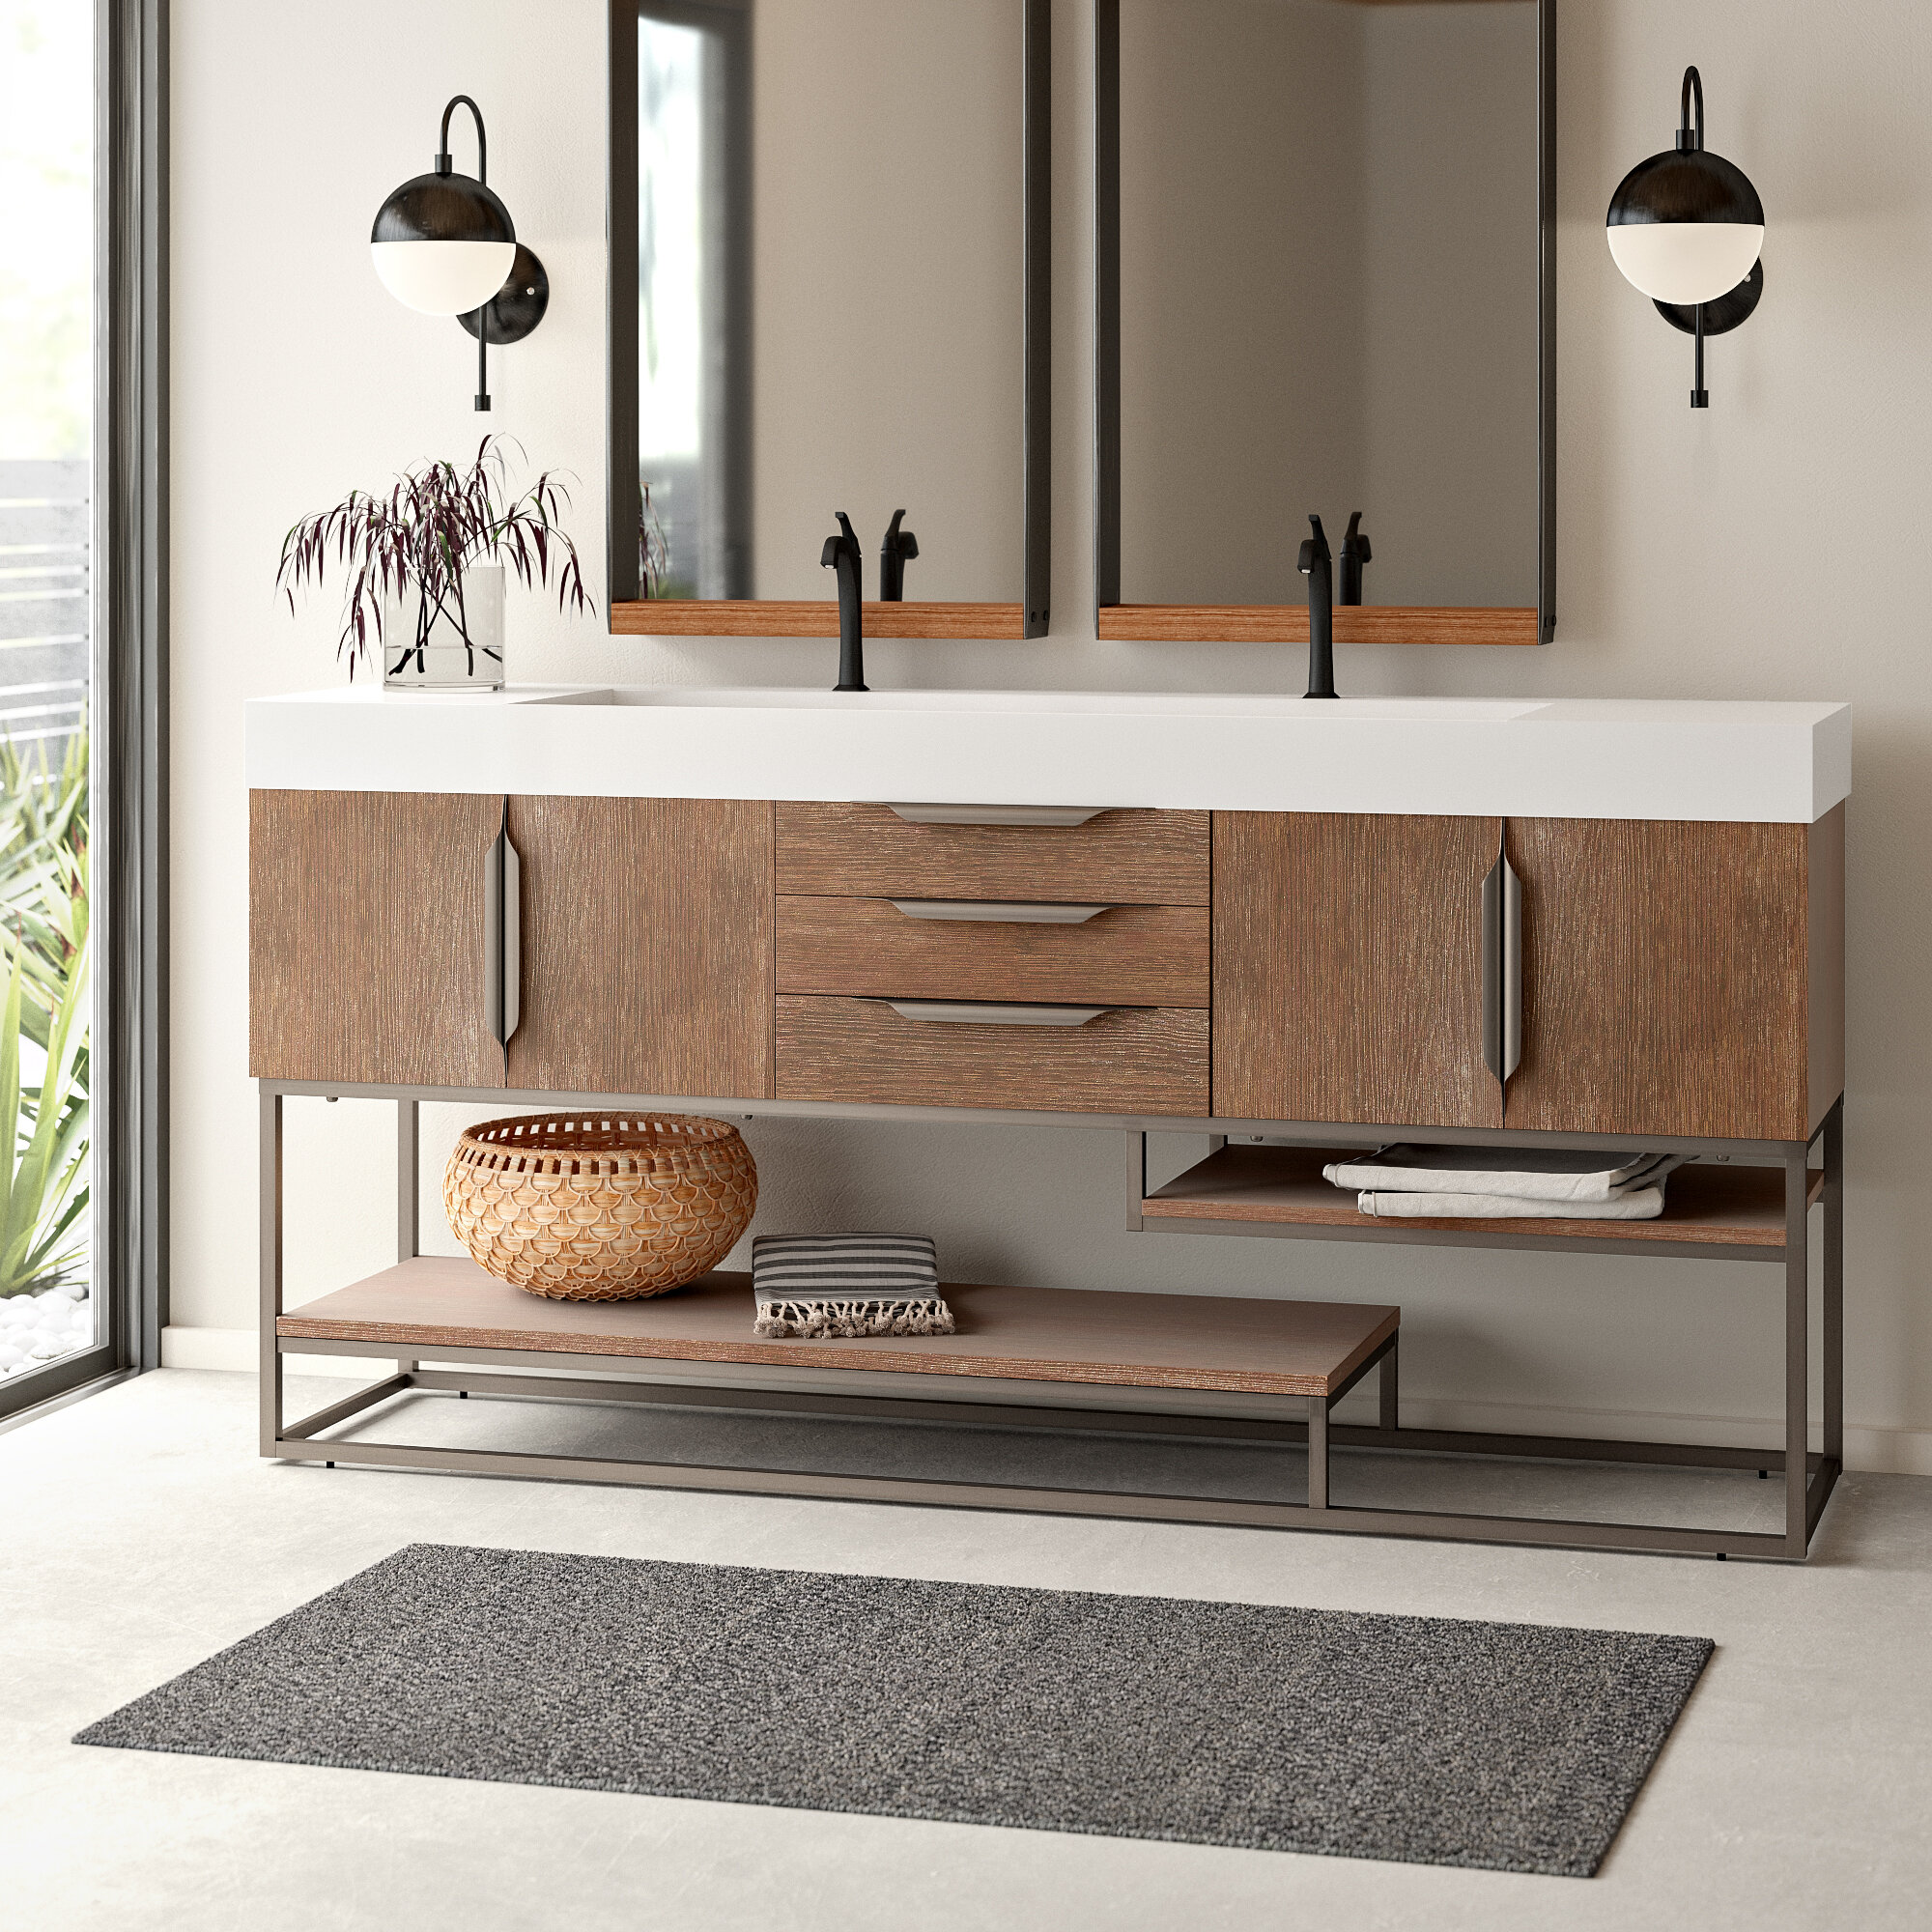 Allmodern Winscombe 73 Double Bathroom Vanity Set Reviews Wayfair